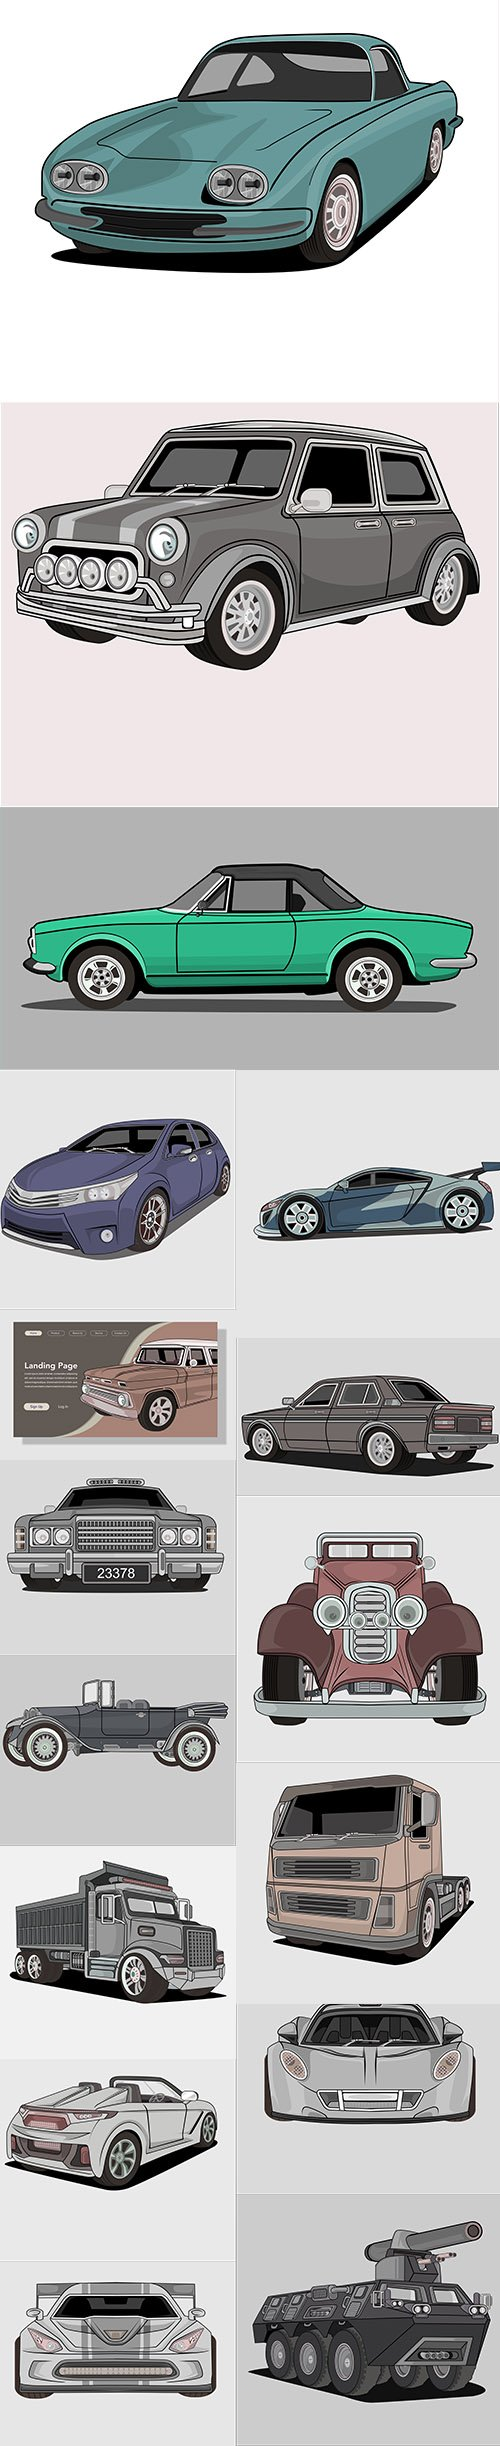 Vintage Car Premium Illustrations Set